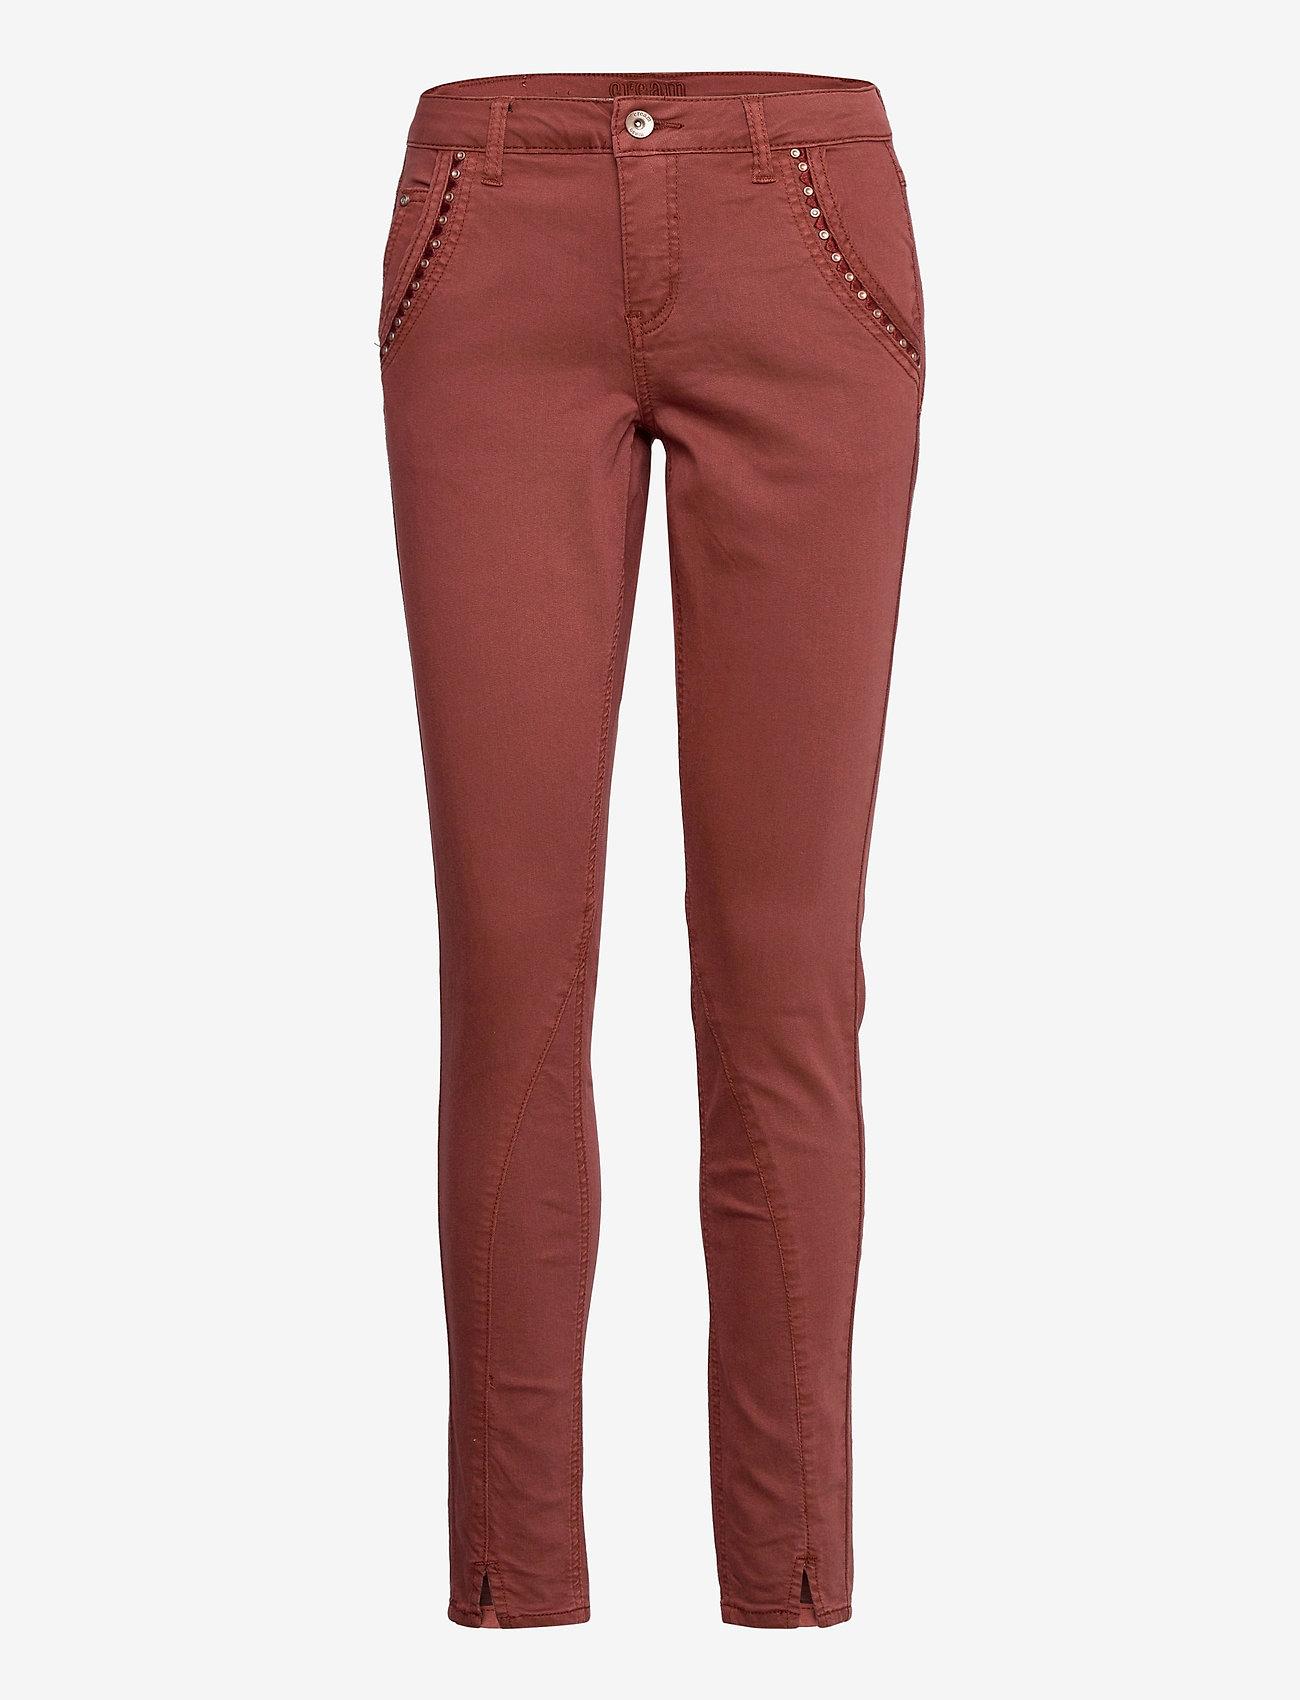 Cream - HollyCR Twill Pants - Baiily Fit - straight regular - henna - 0